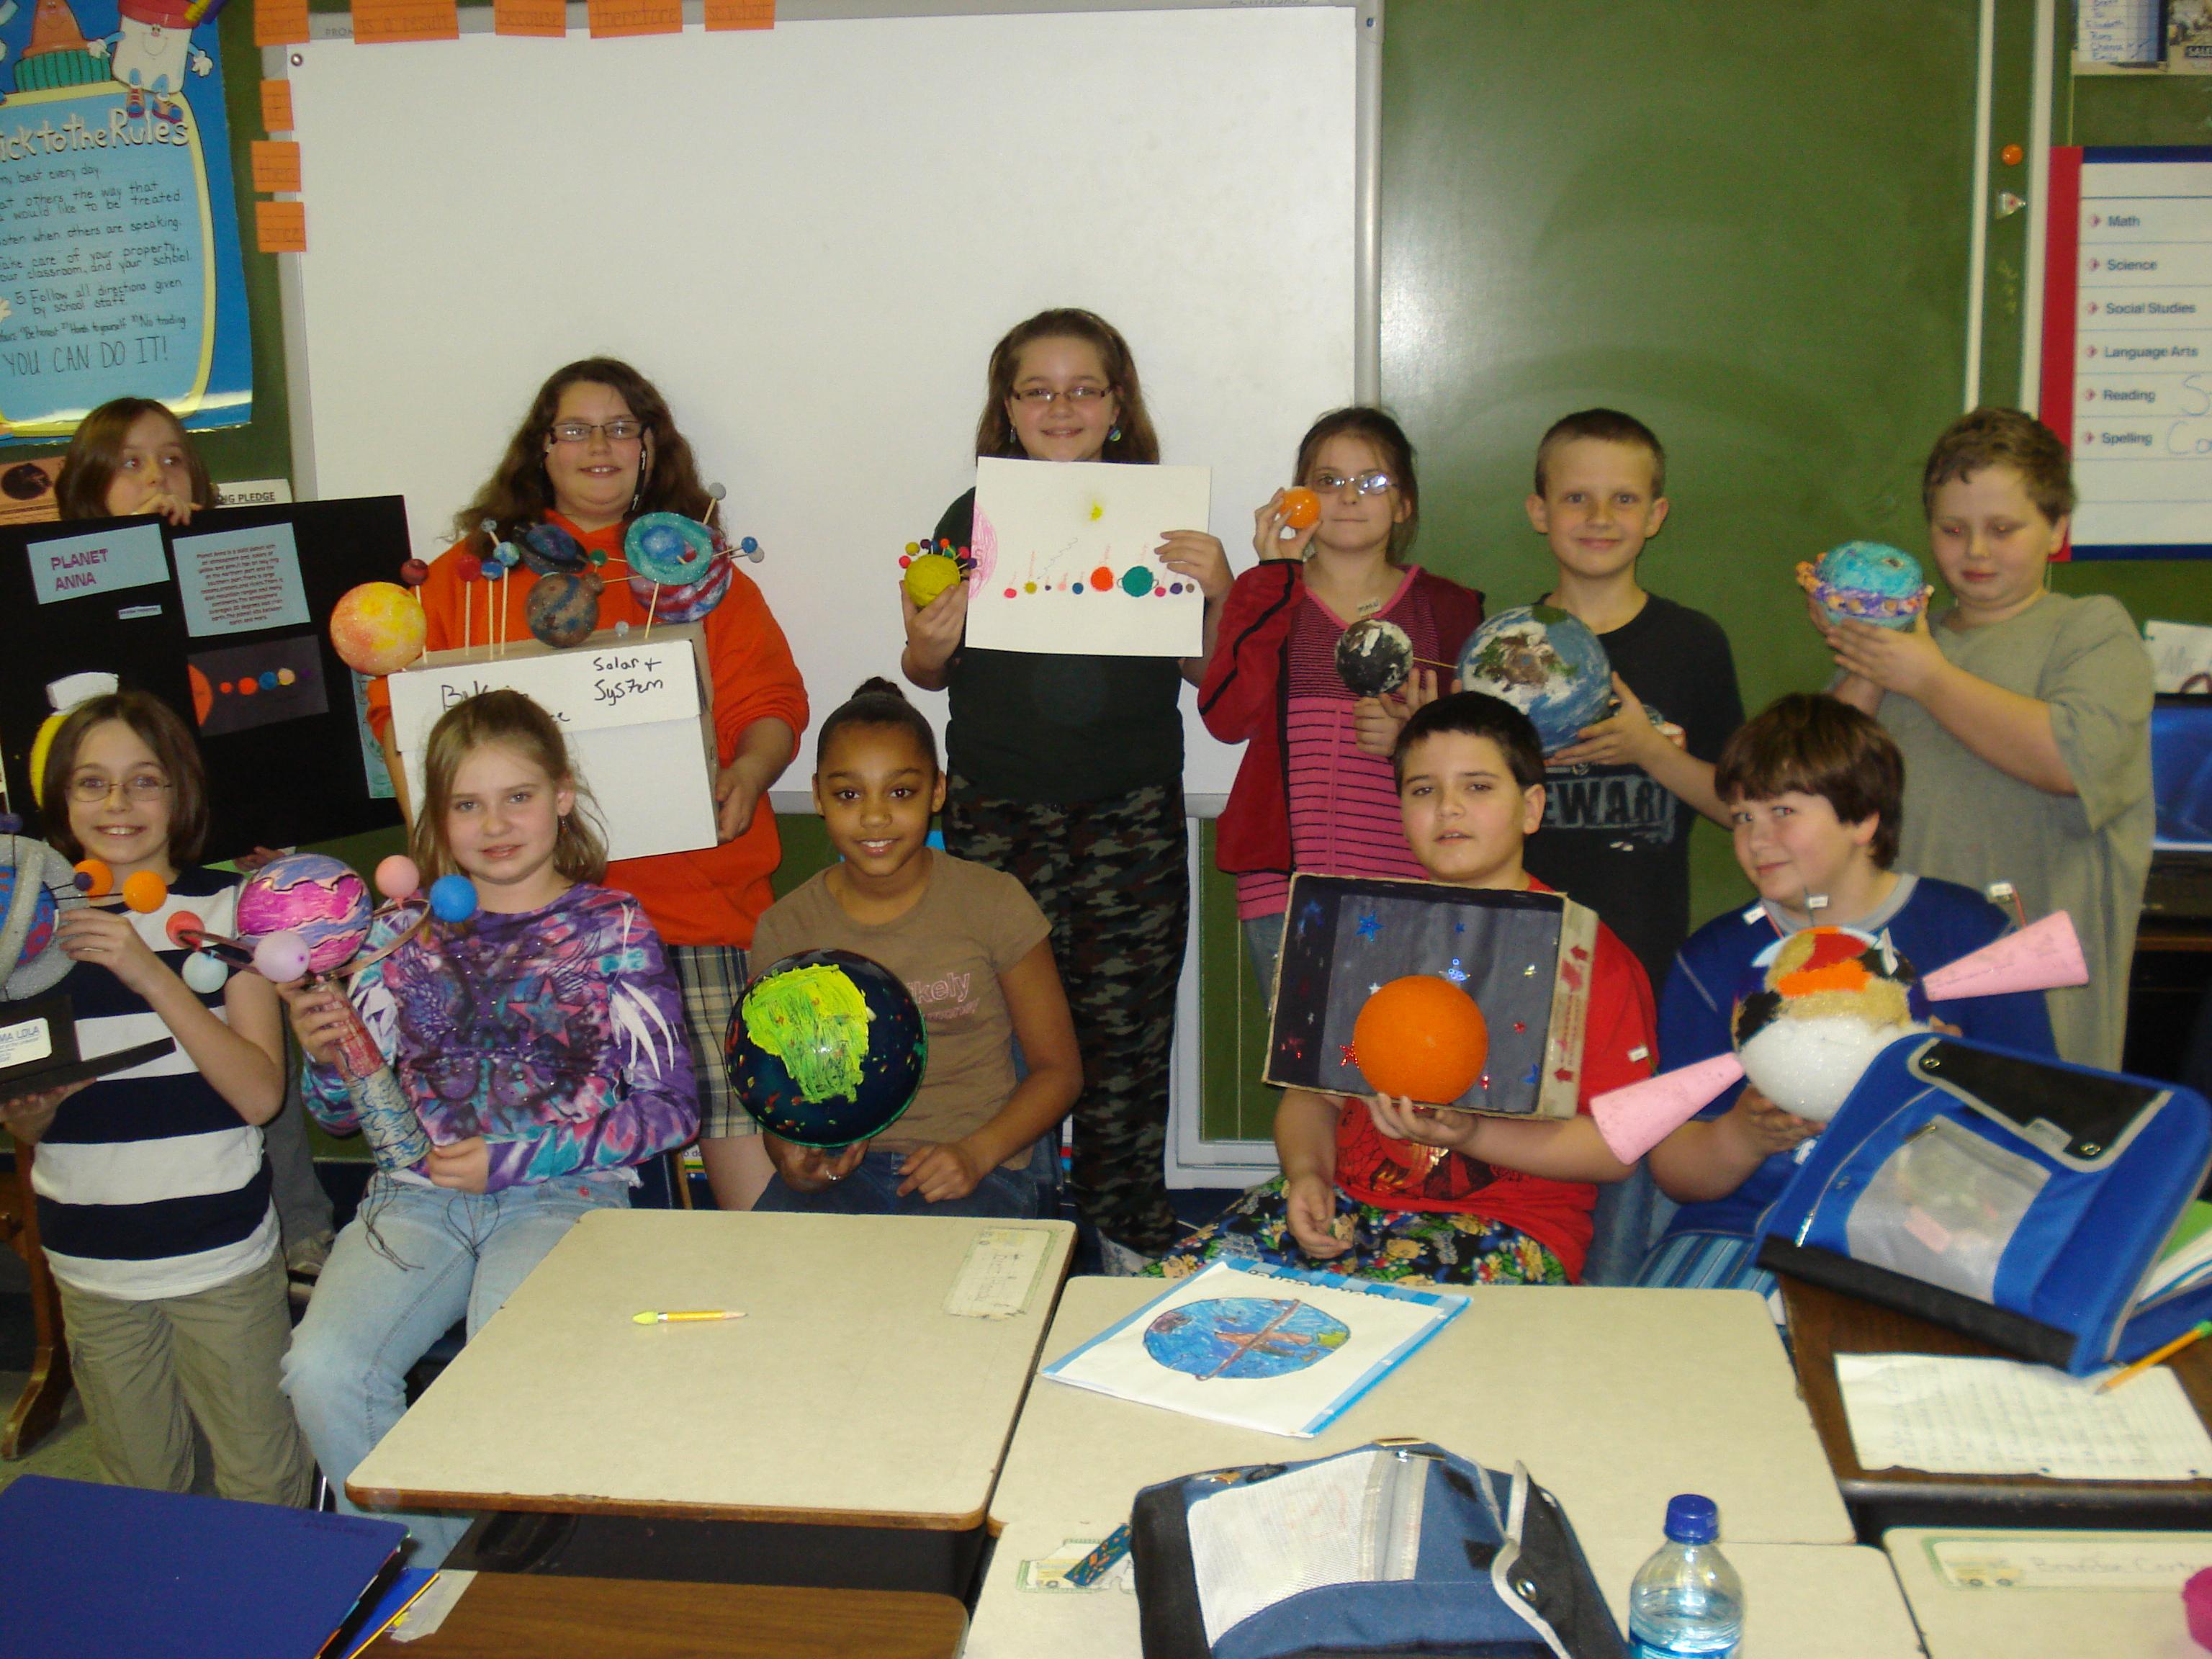 4th Grade Science Projects Are Impressive